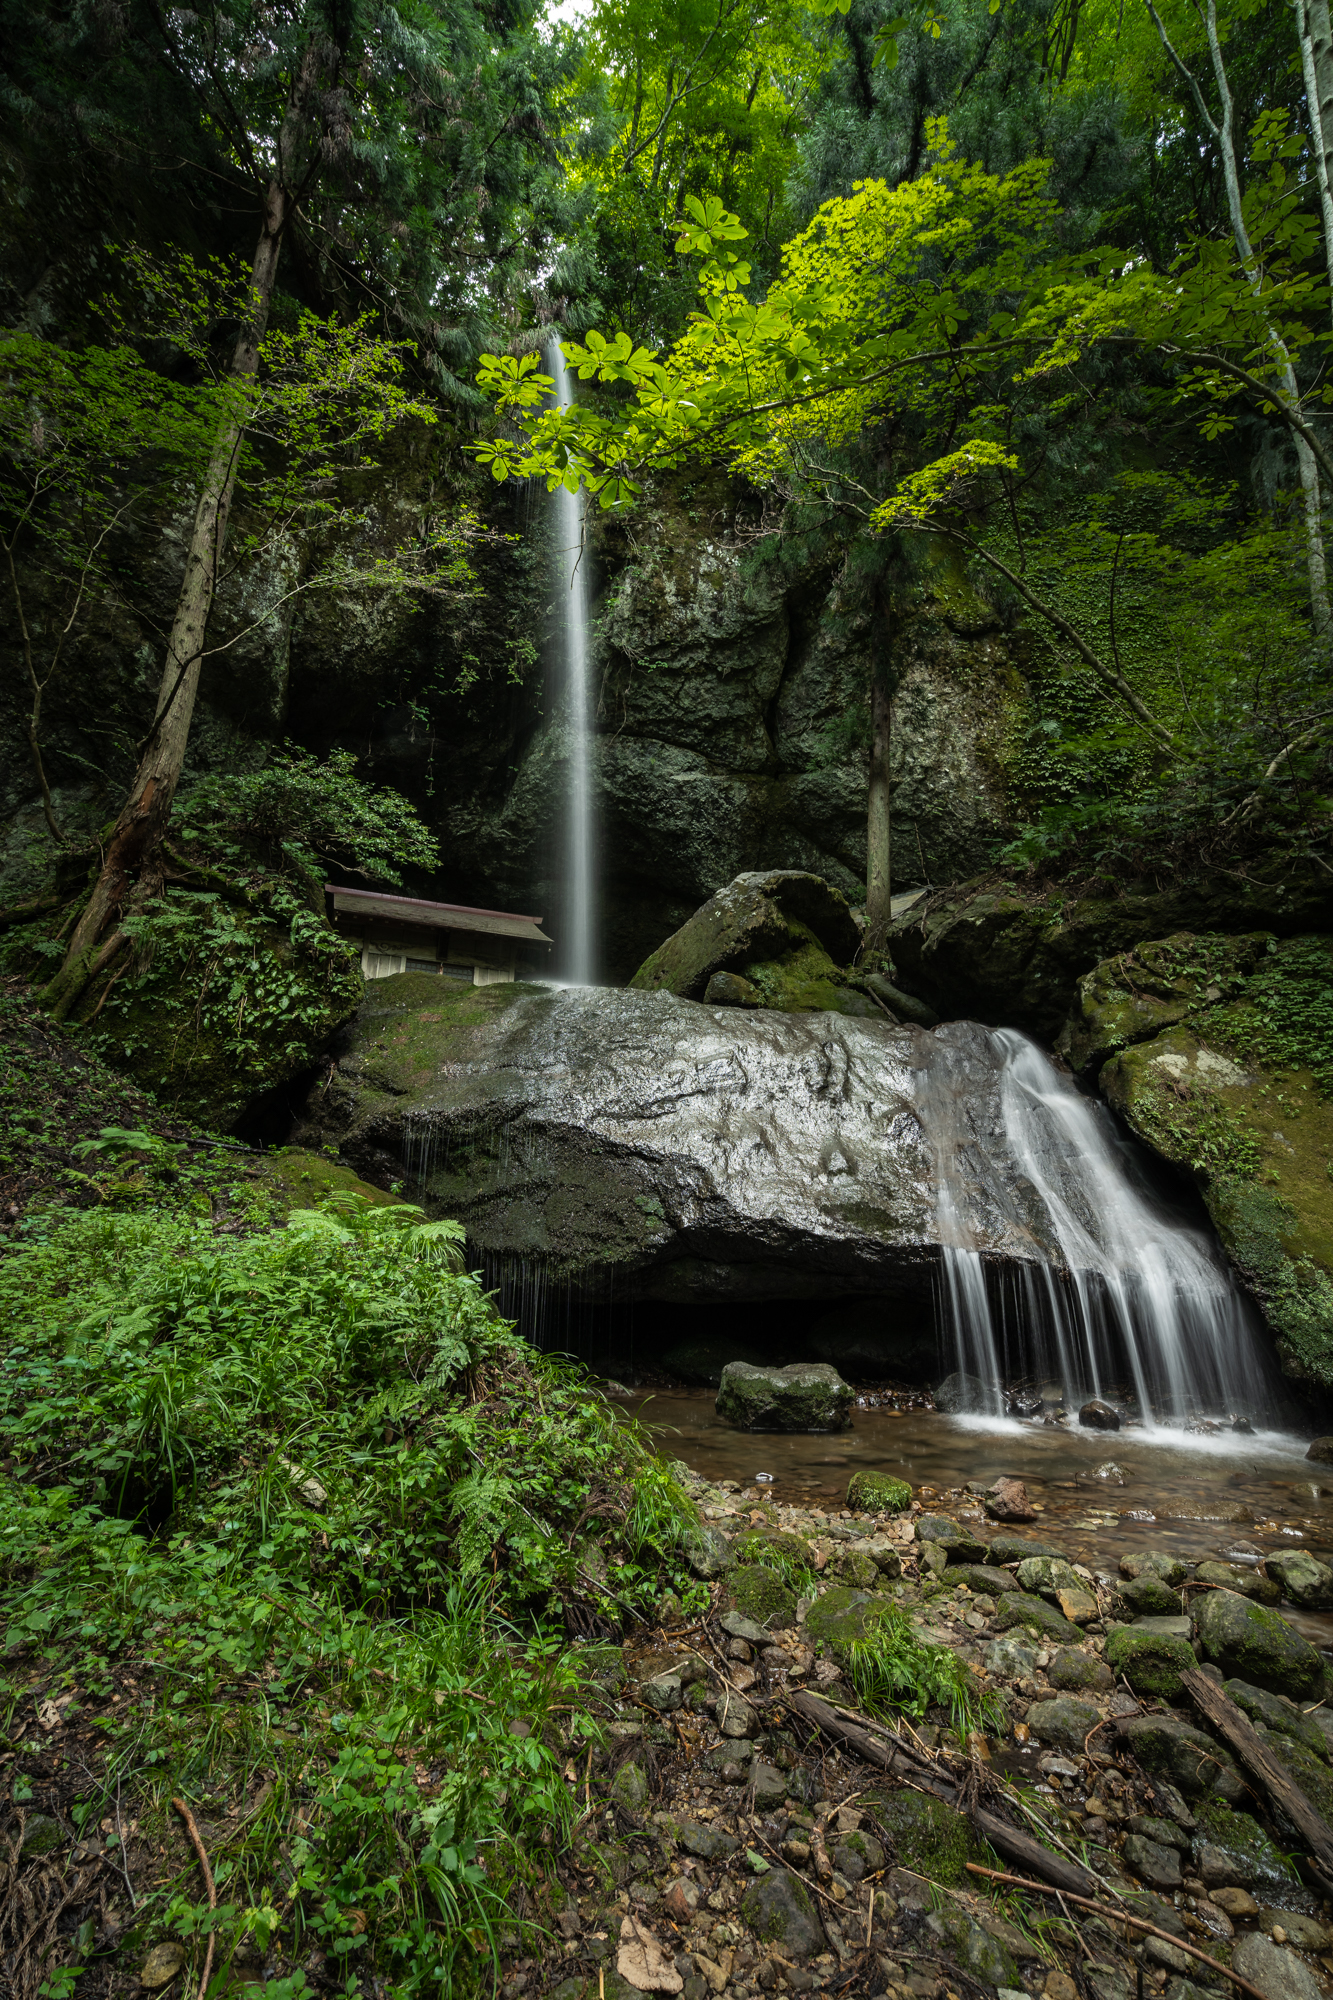 DSC01017 兵庫県 吉滝(滝と神社の幻想的な景色!  関西・近畿・兵庫県の滝スポット!撮影した写真の紹介、 アクセス情報や撮影ポイントなど!)